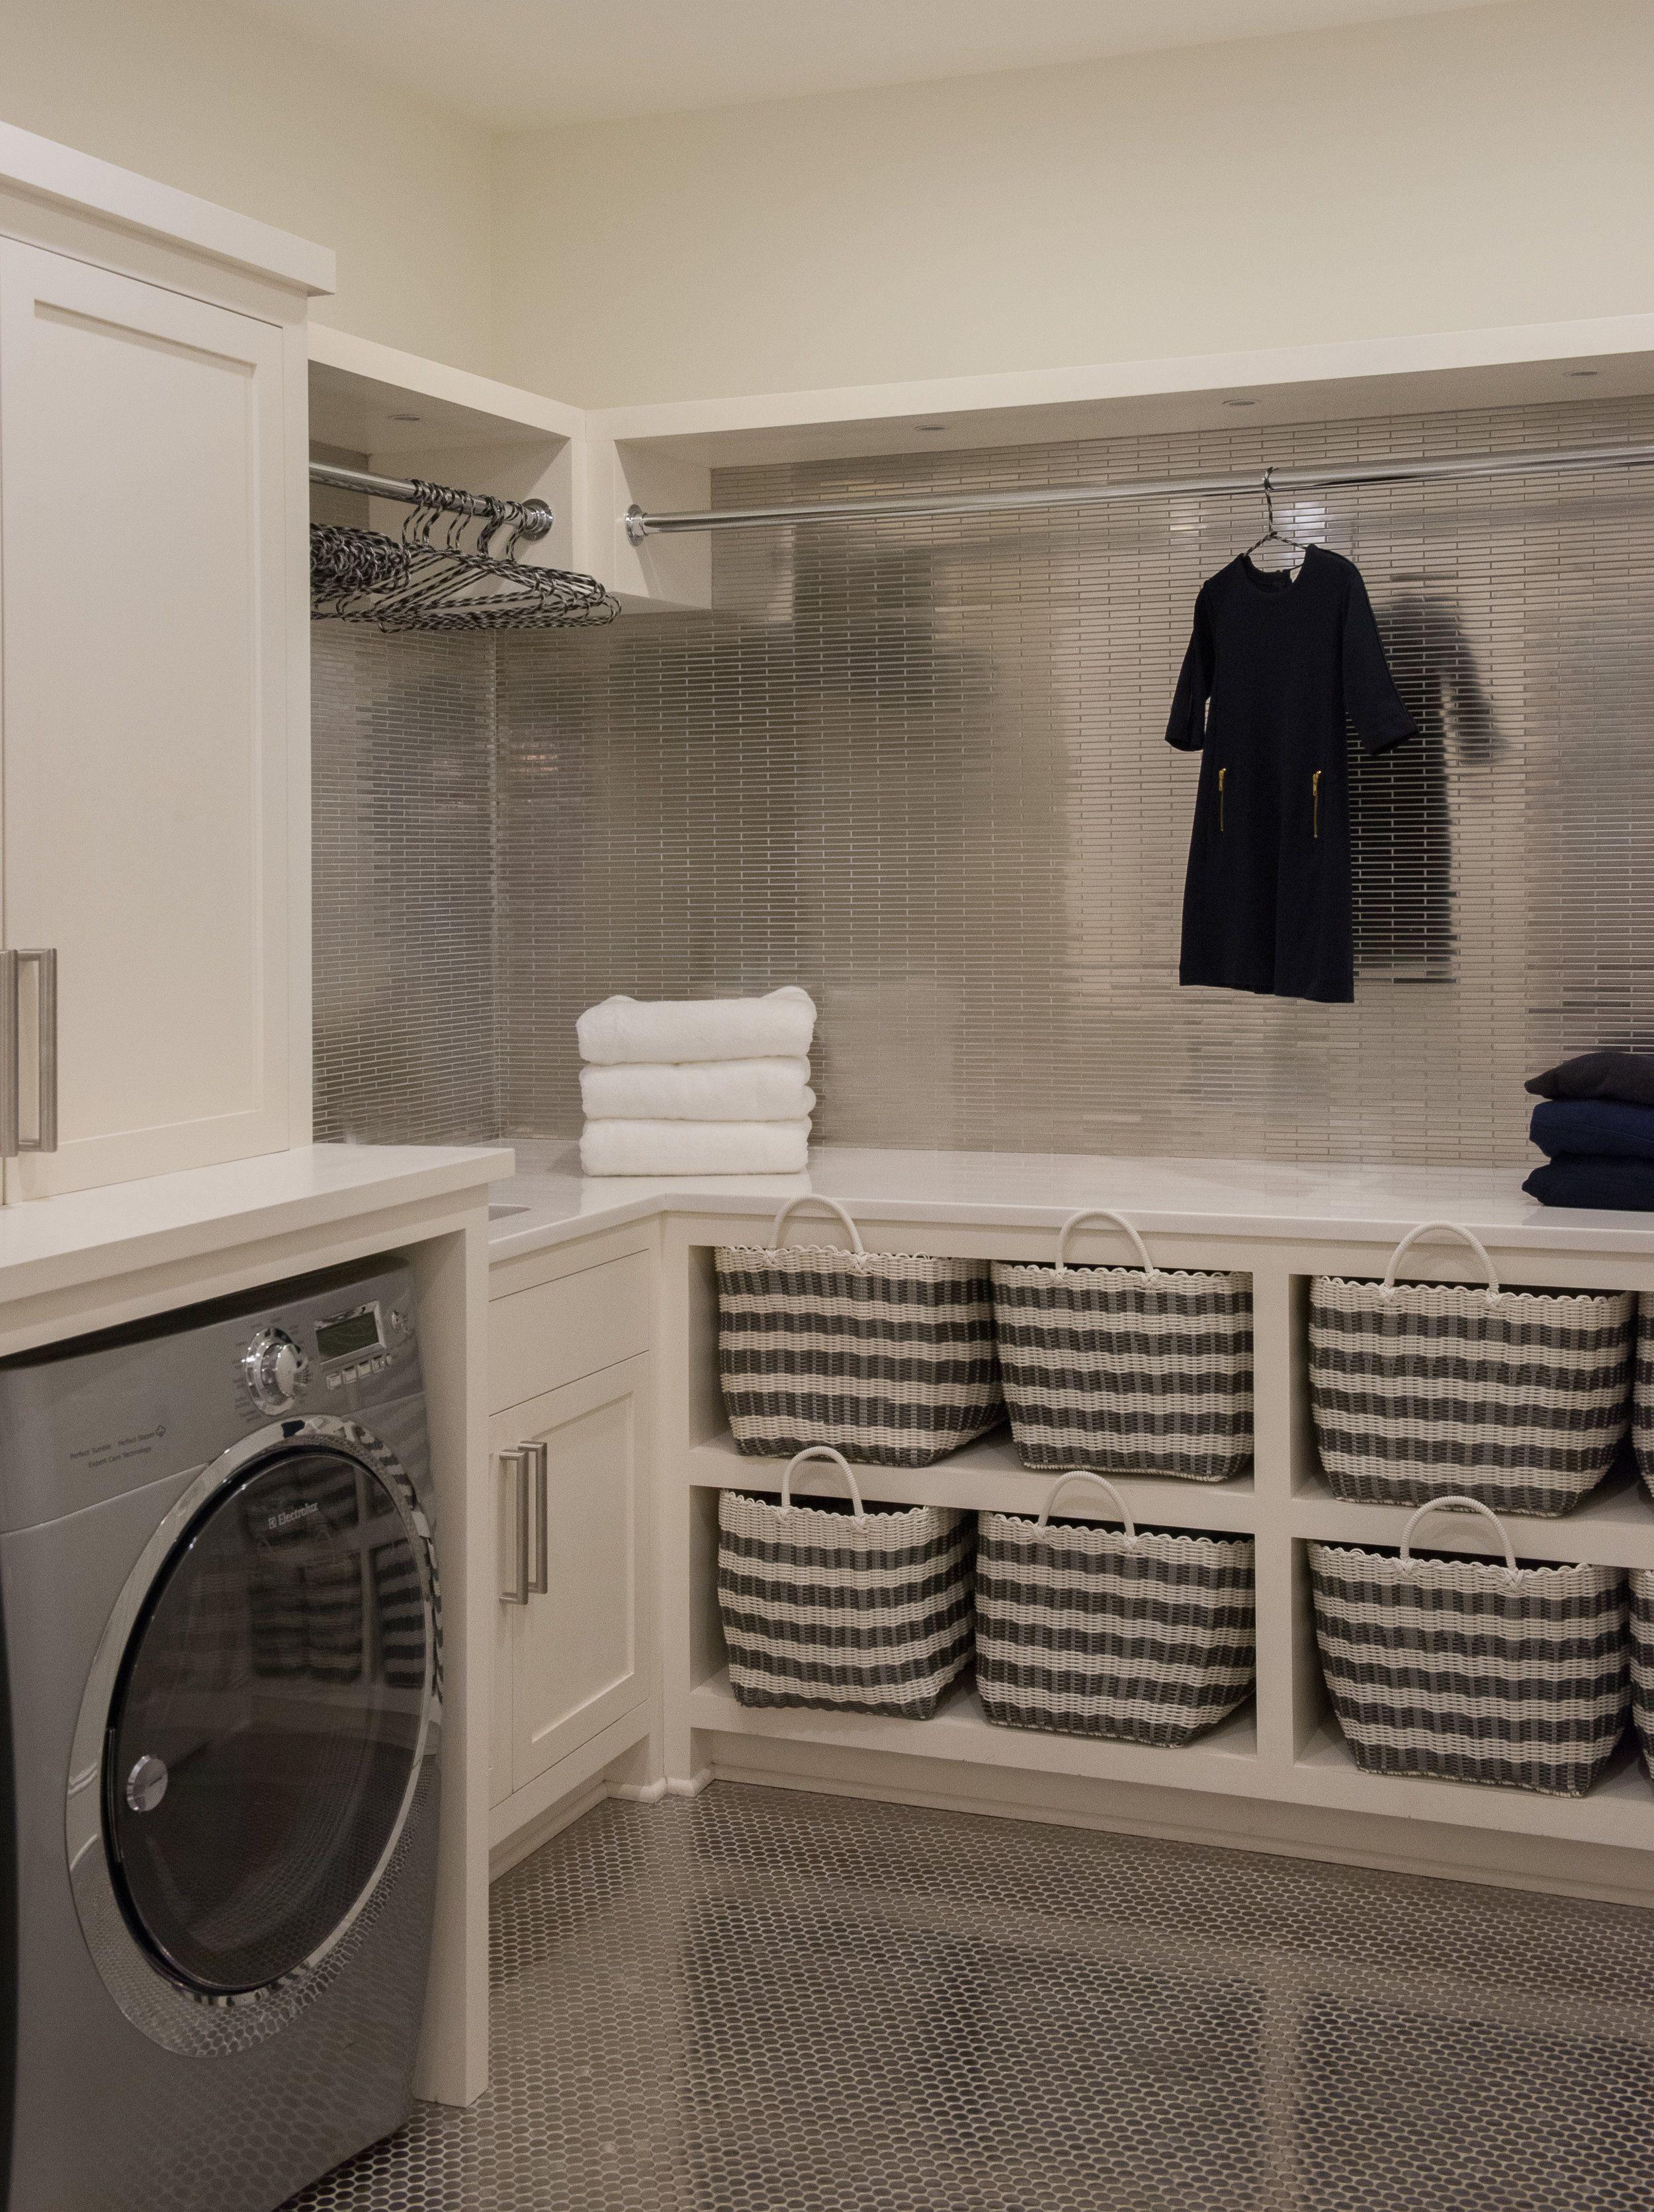 Pin by JOOM on Hotel | Farmhouse laundry room, Laundry room remodel